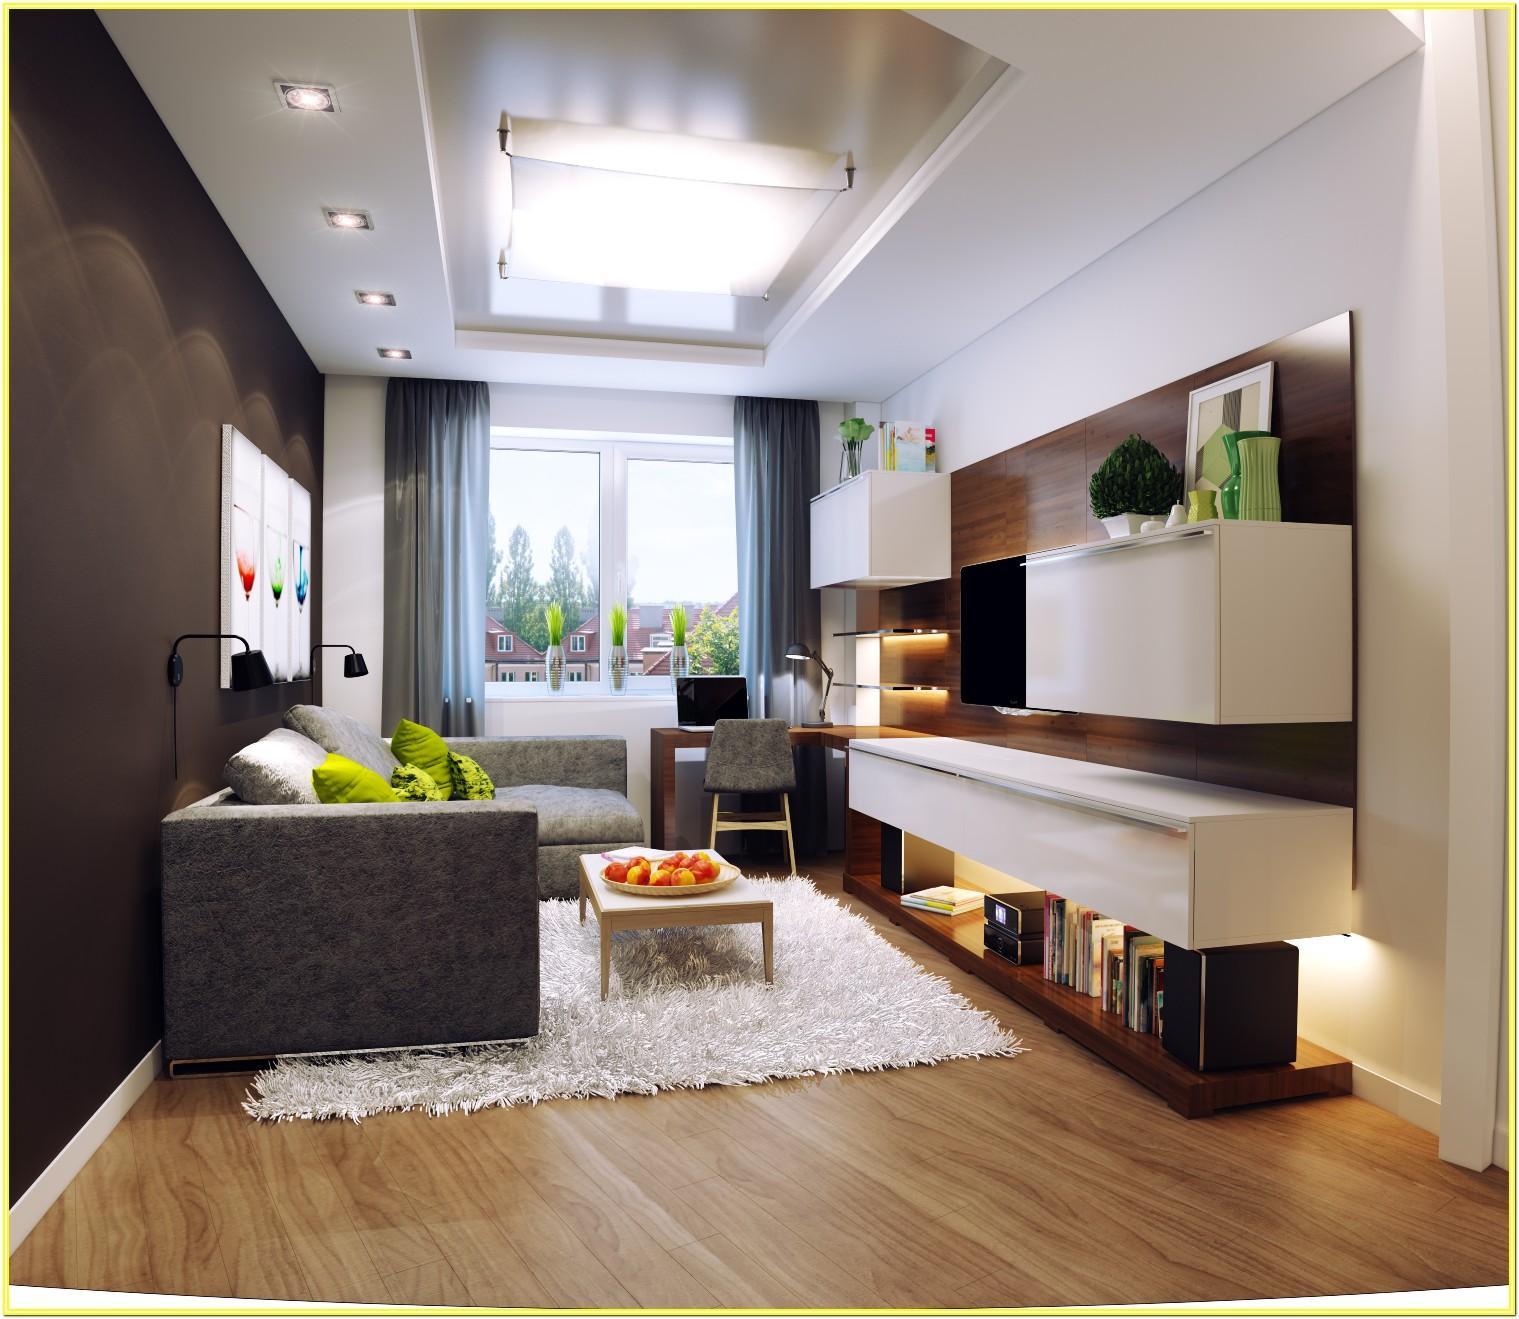 Small Condo Living Room Design Ideas